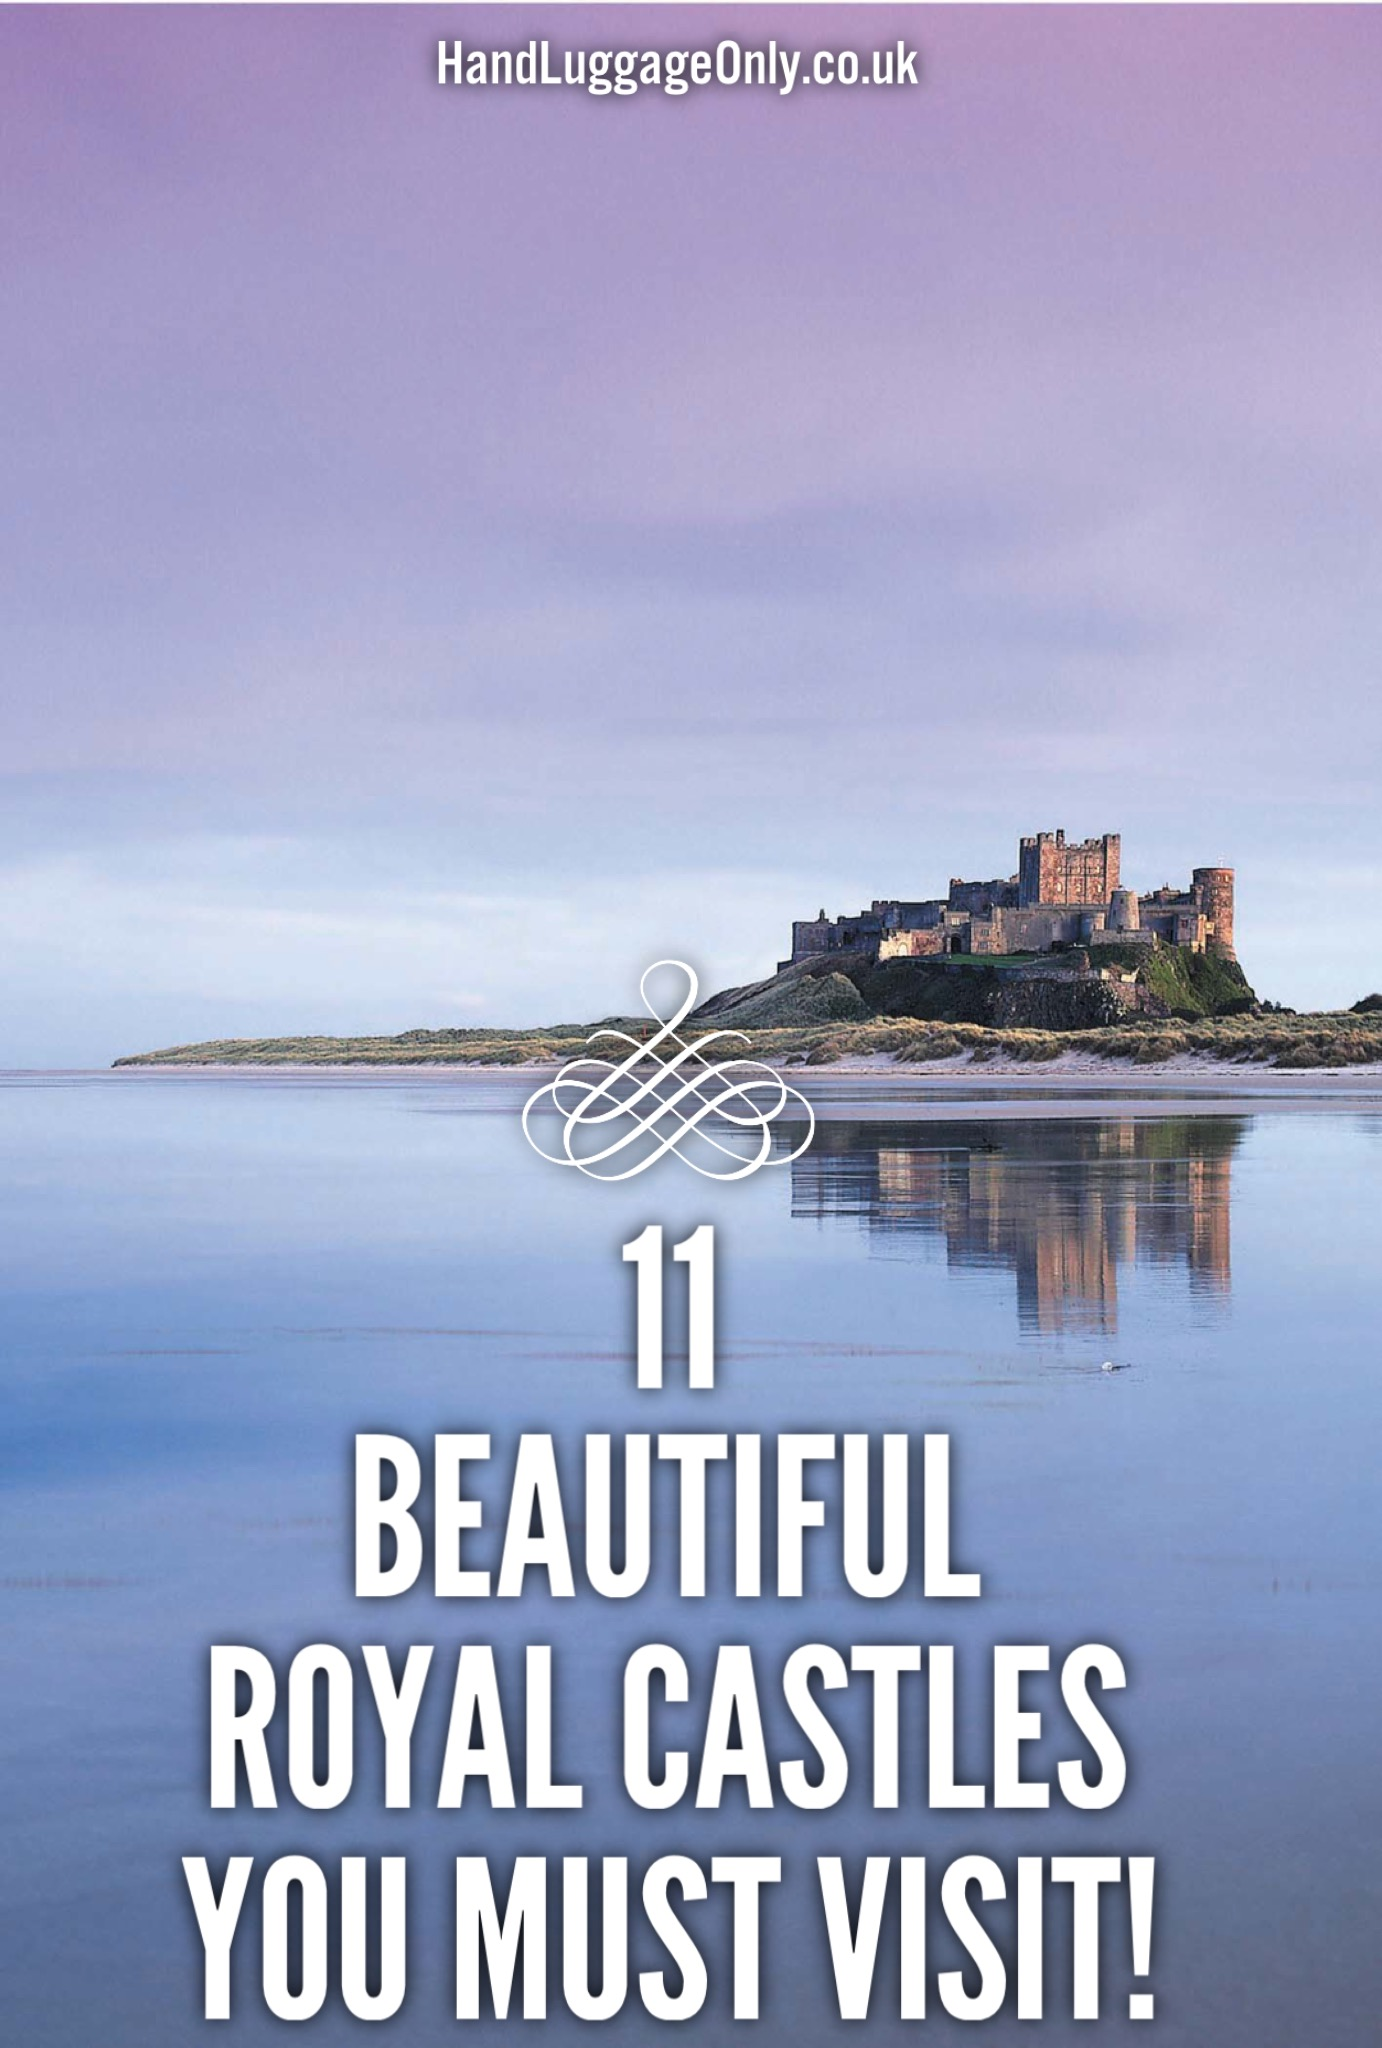 Royal Castles To Visit